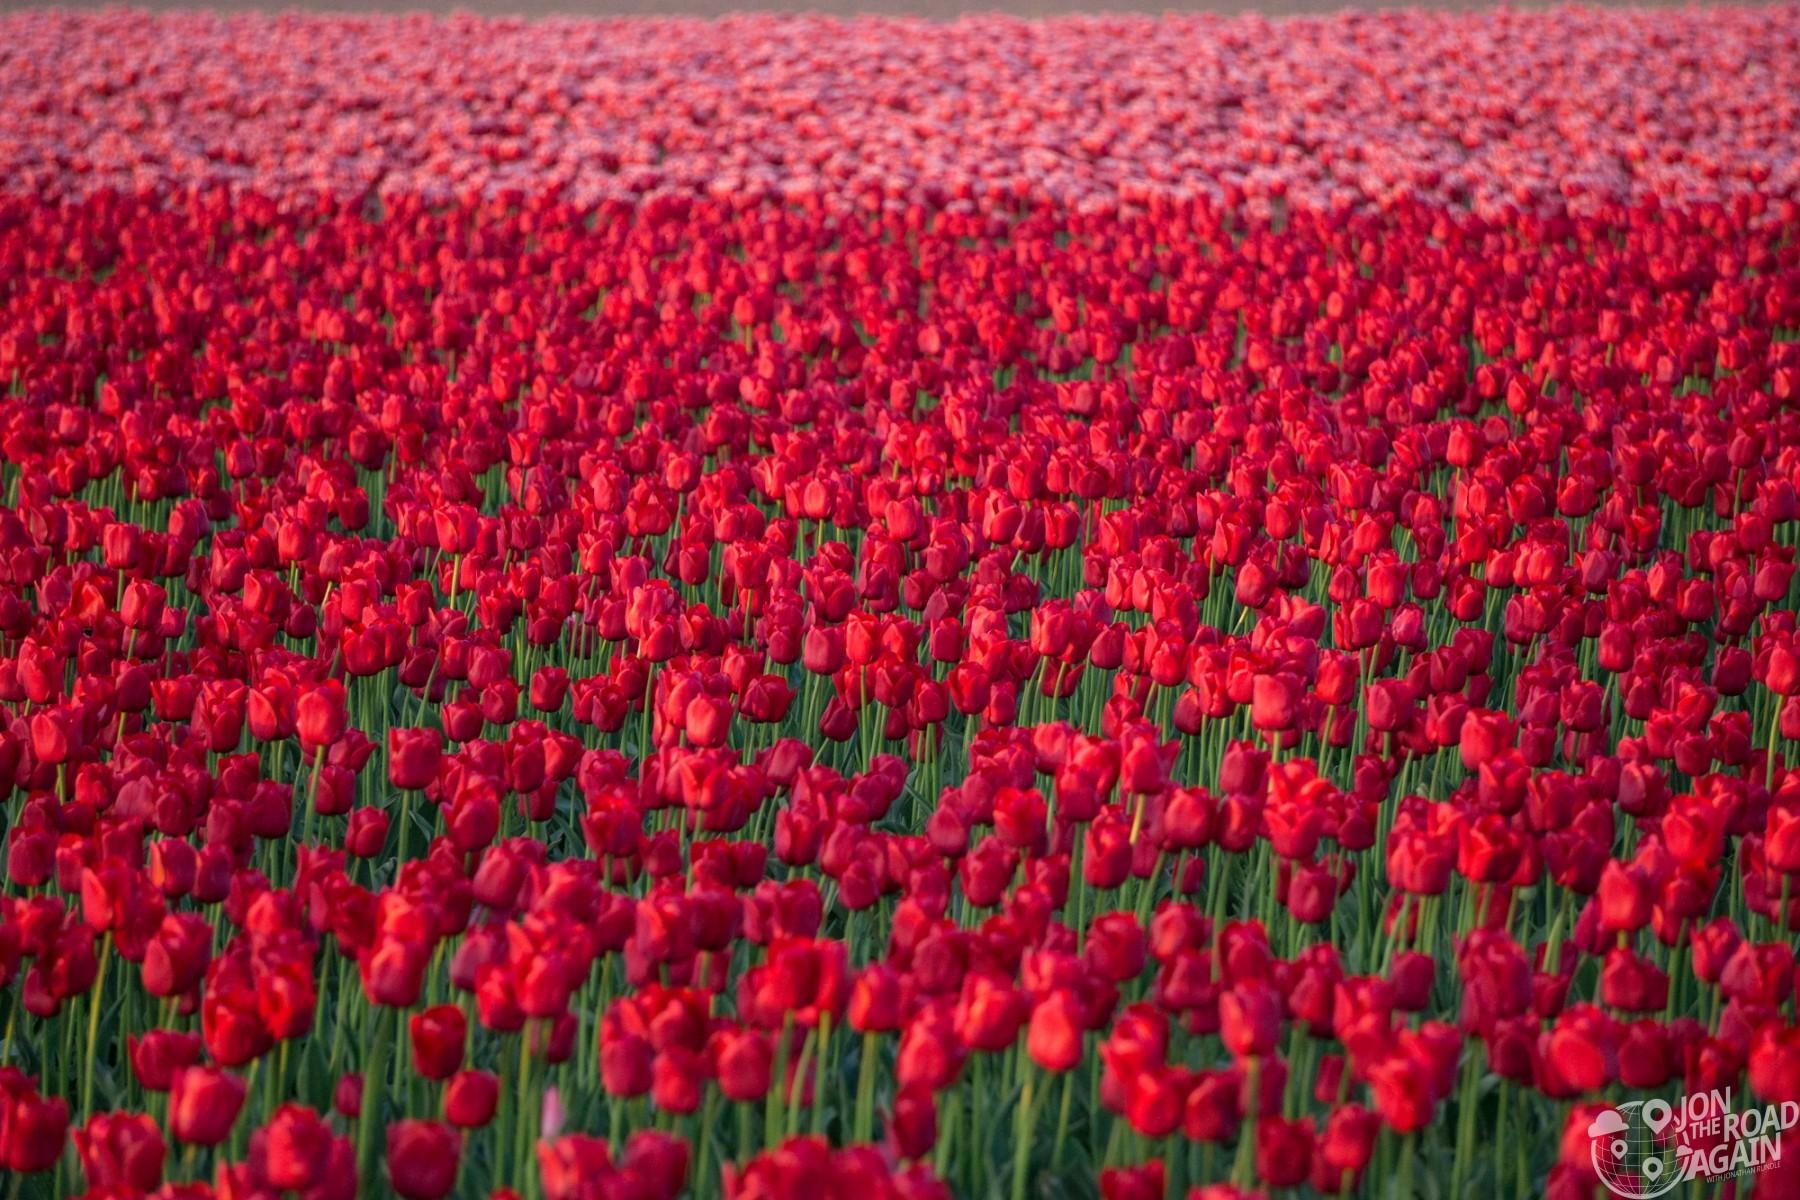 Skagit Valley Tulip Festival fields